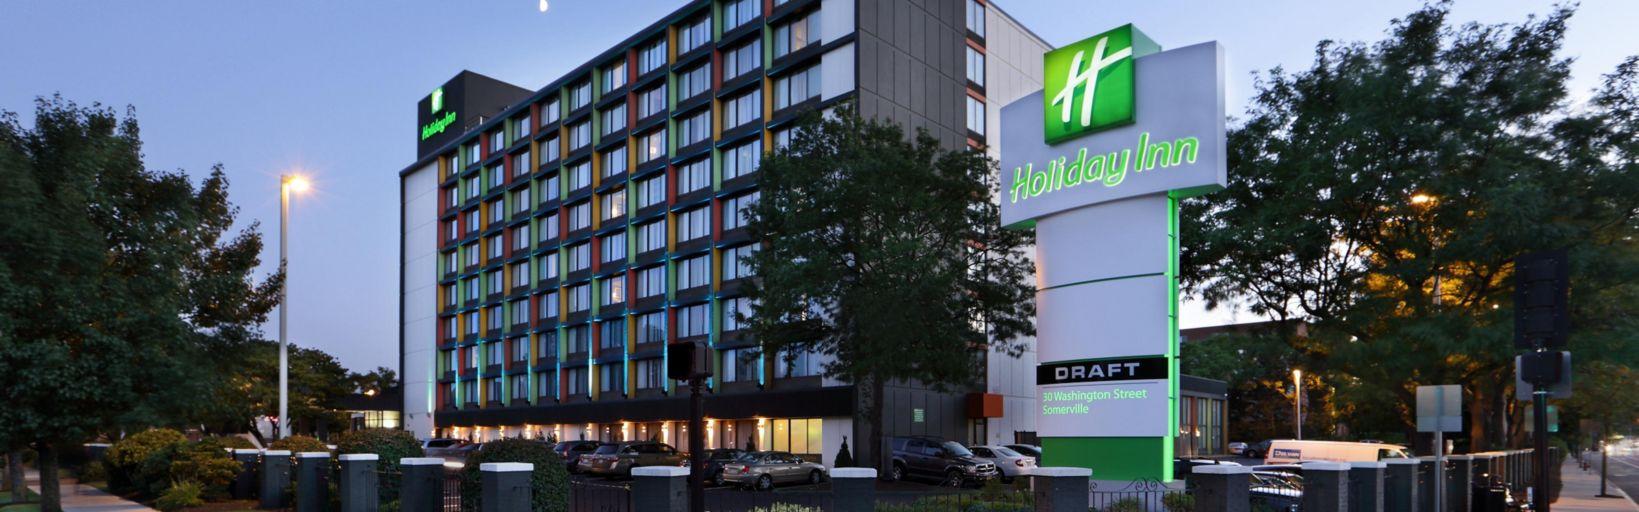 Holiday Inn Boston Bunker Hill Area IHG Hotel